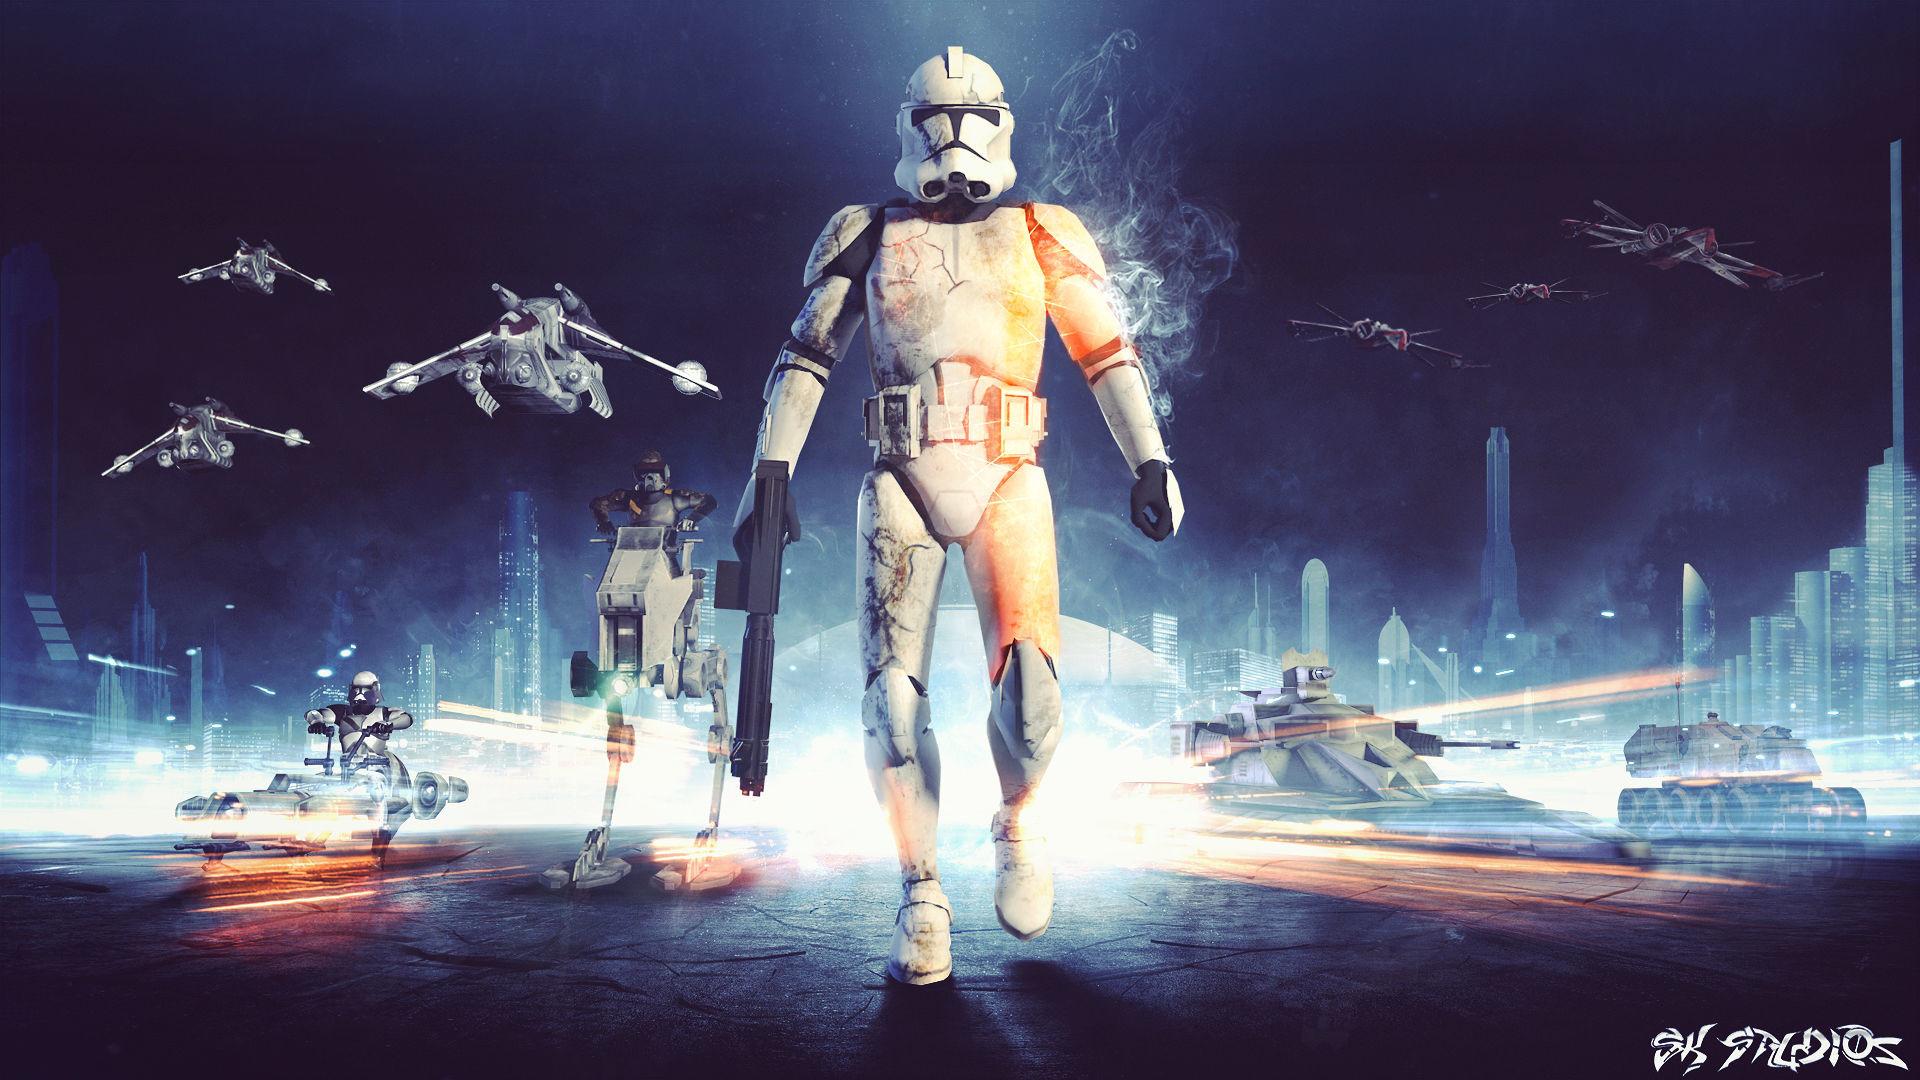 Star Wars Episode 7 Concept Art · Star Wars Episode 7 6510 Hd Wallpapers